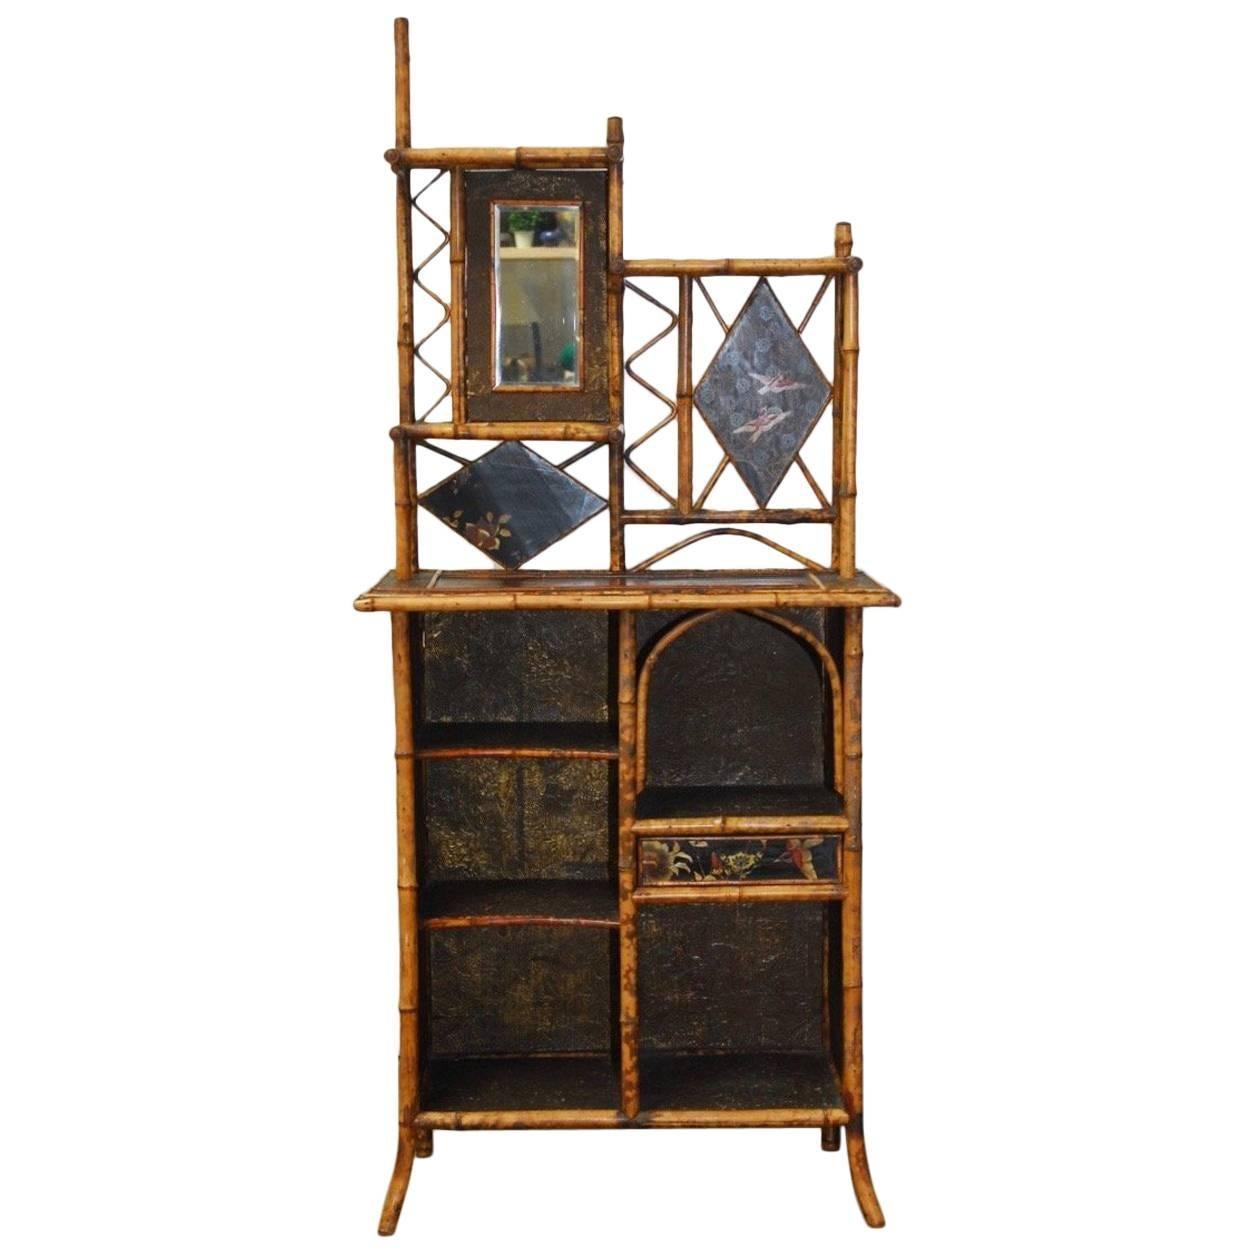 19th Century English Regency Bamboo Etagere or Bookcase